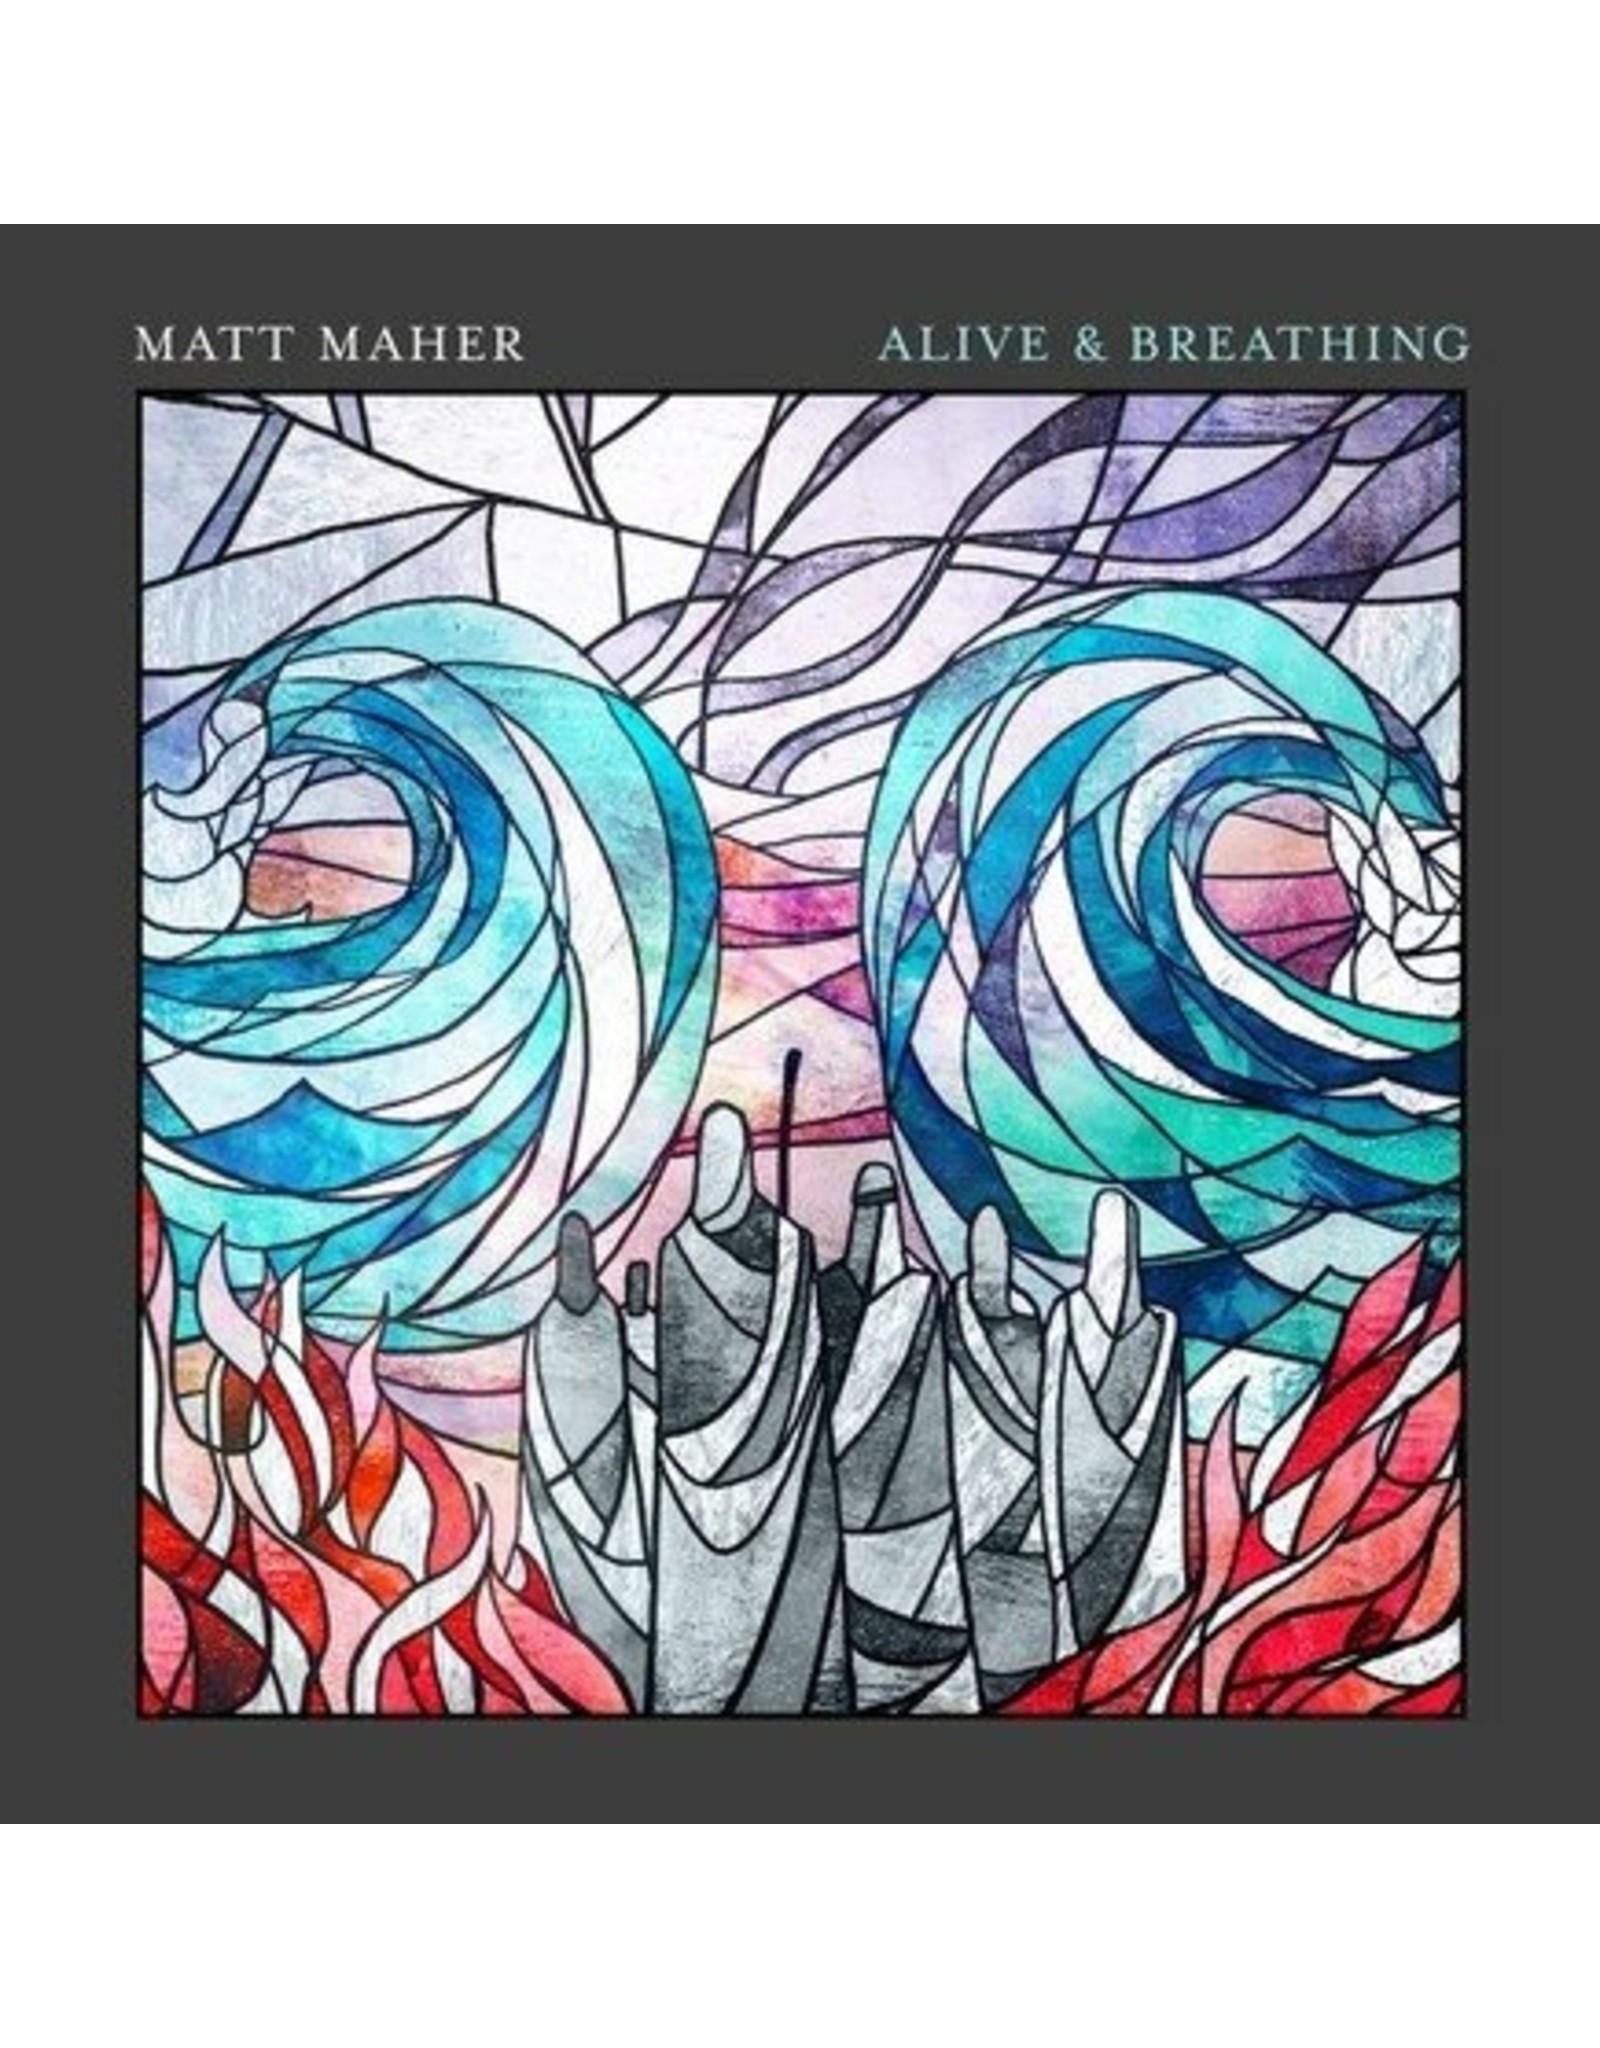 ALIVE & BREATHING CD